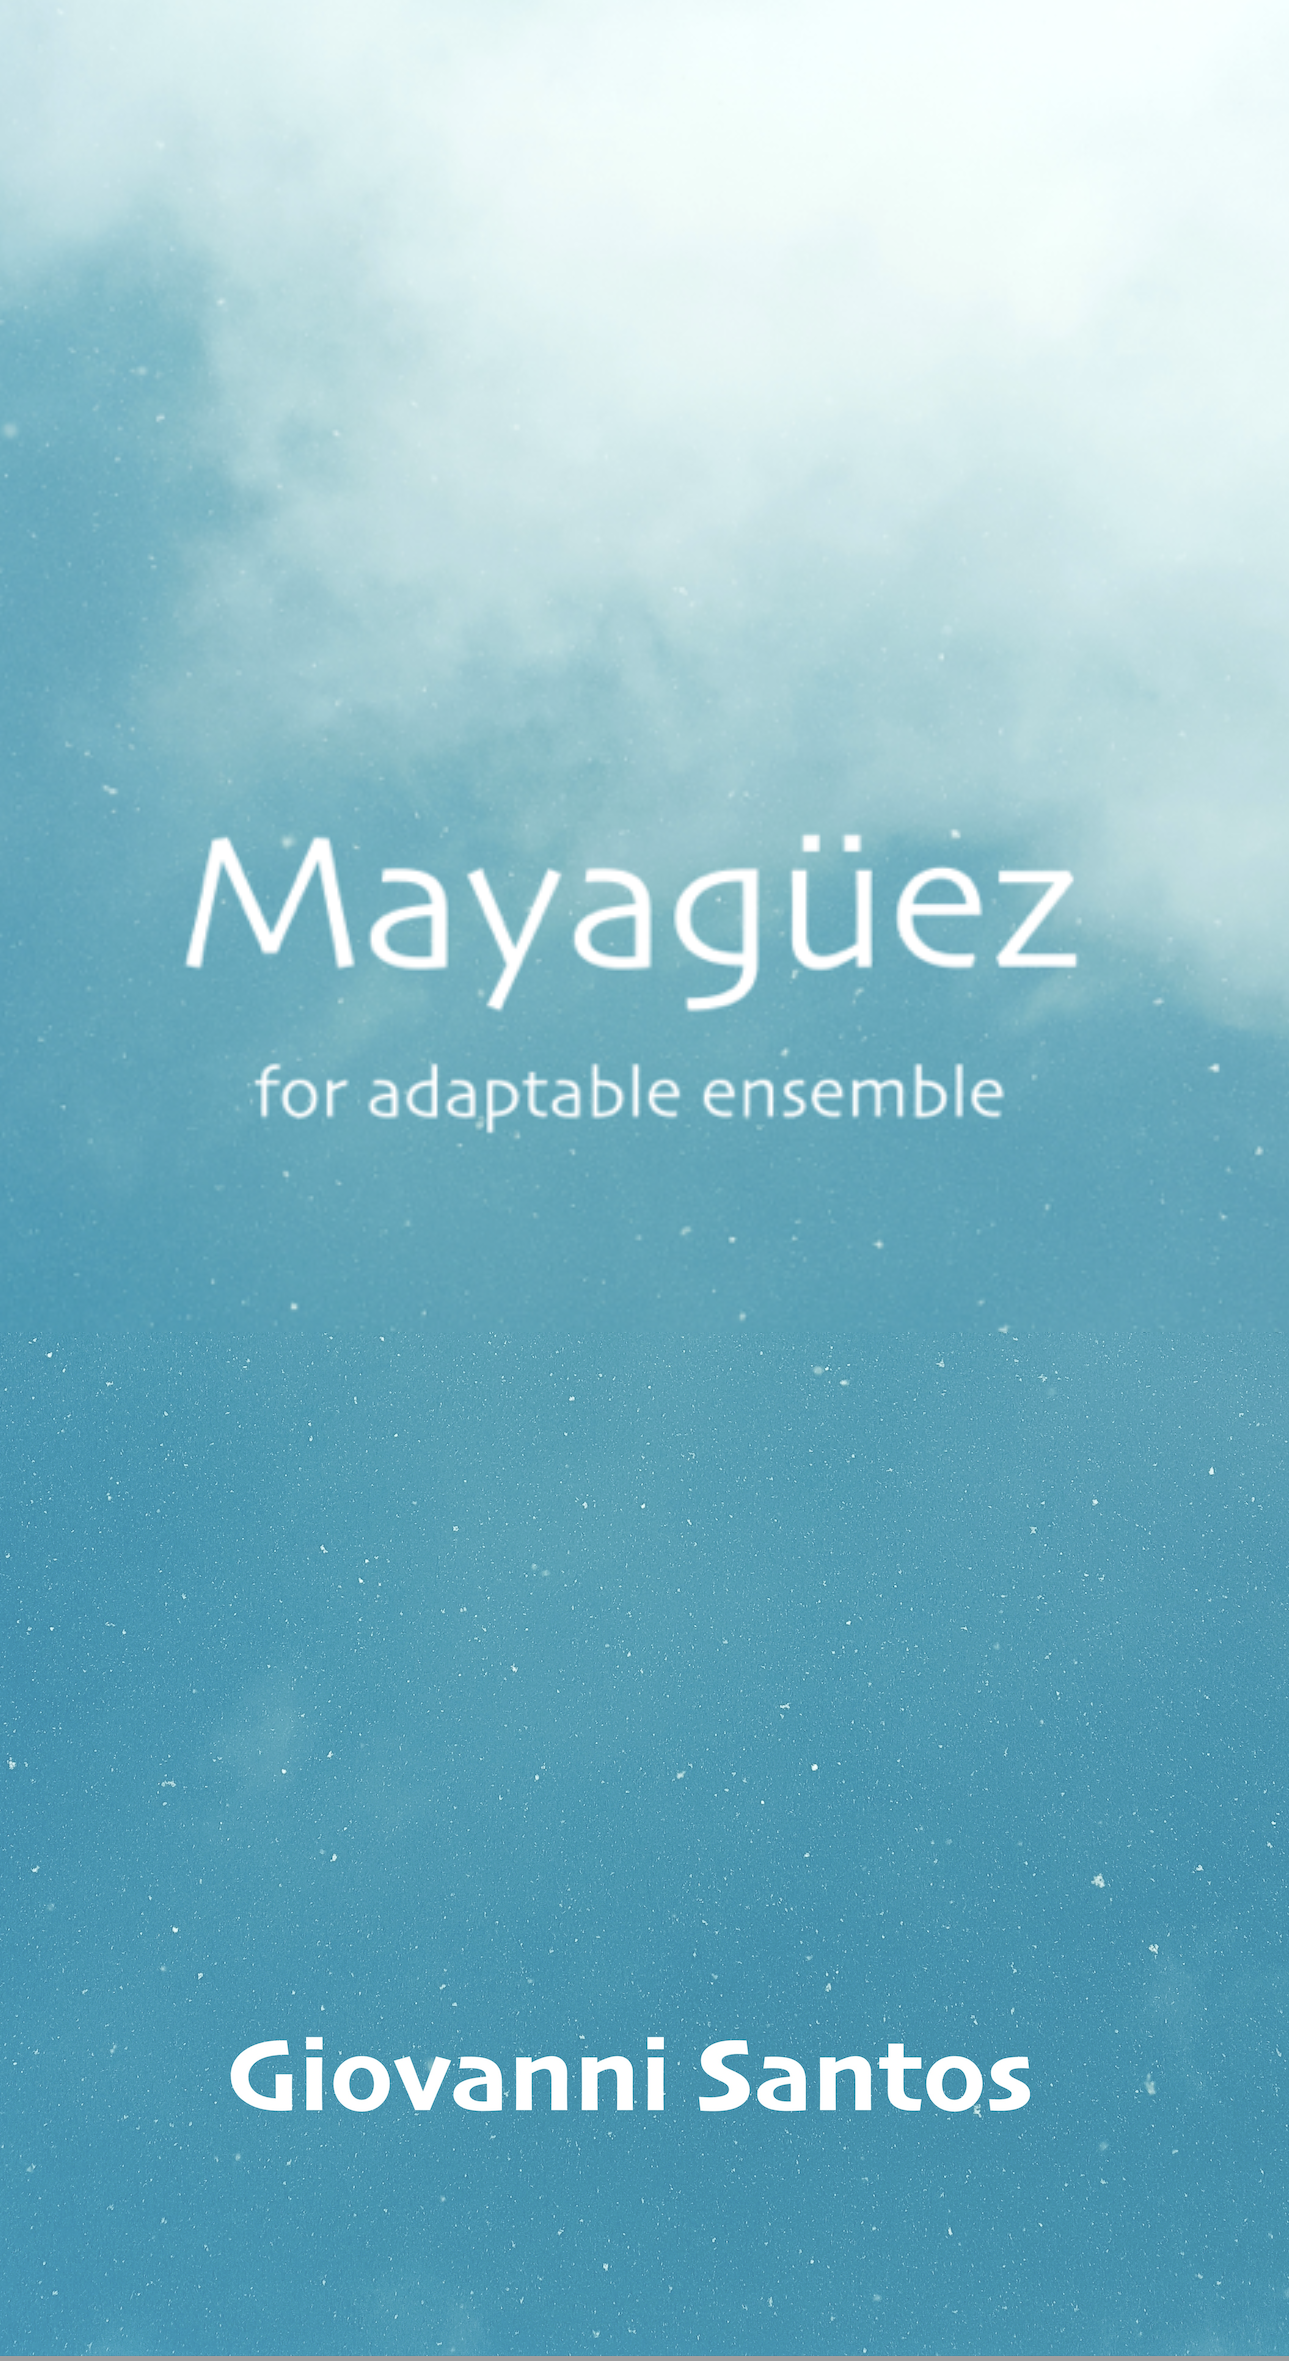 Mayagüez by Giovanni Santos